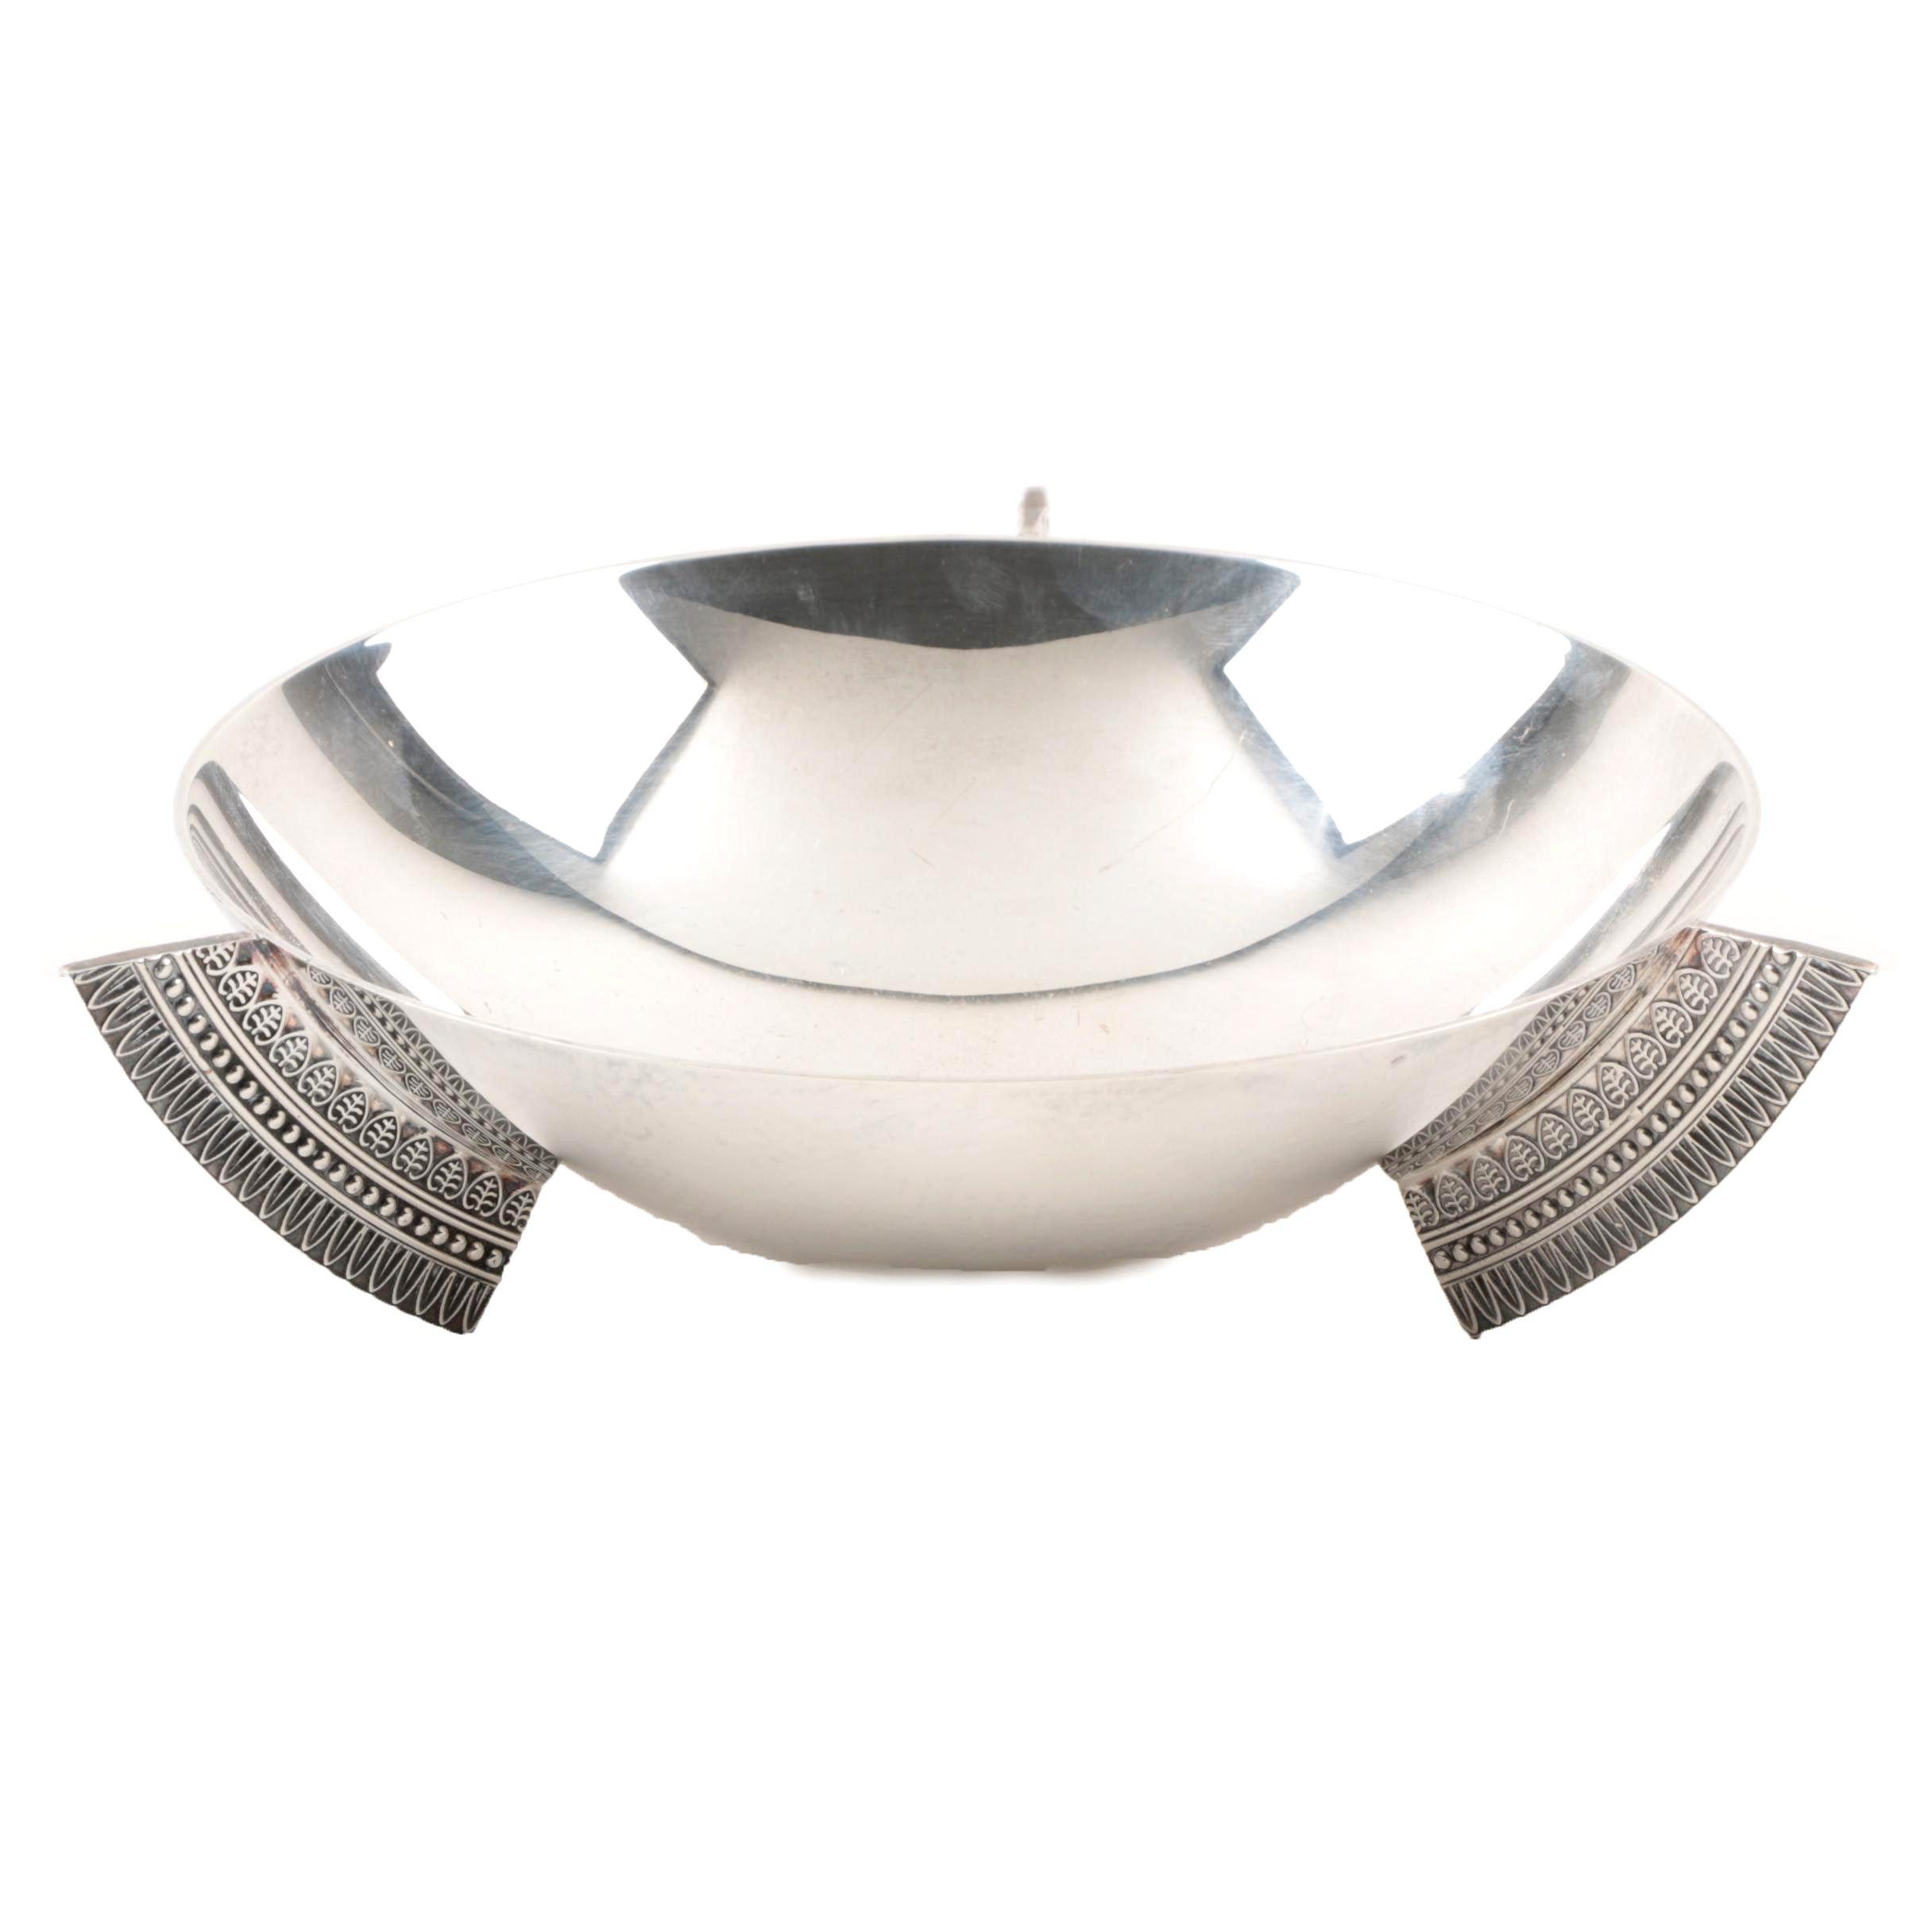 Christofle Modernist Silver Plate Bowl